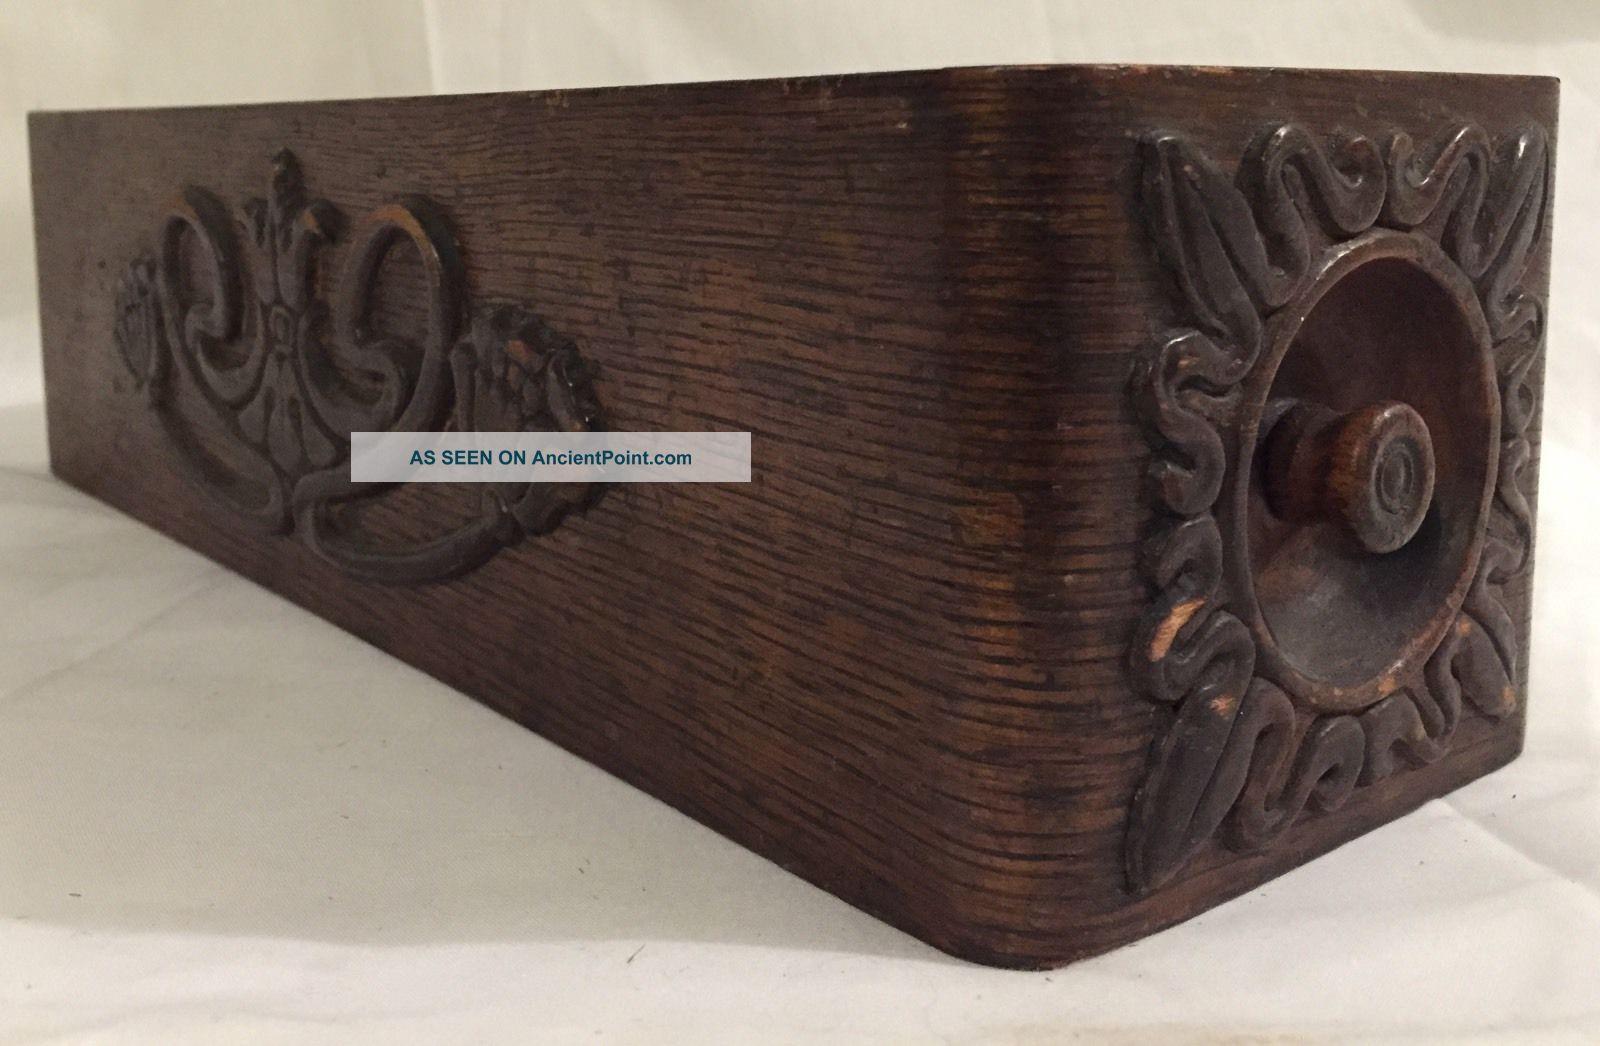 Vintage Singer Sewing Machine Drawer Dark Wood Ornate Treadle Left Side Drawer Other photo